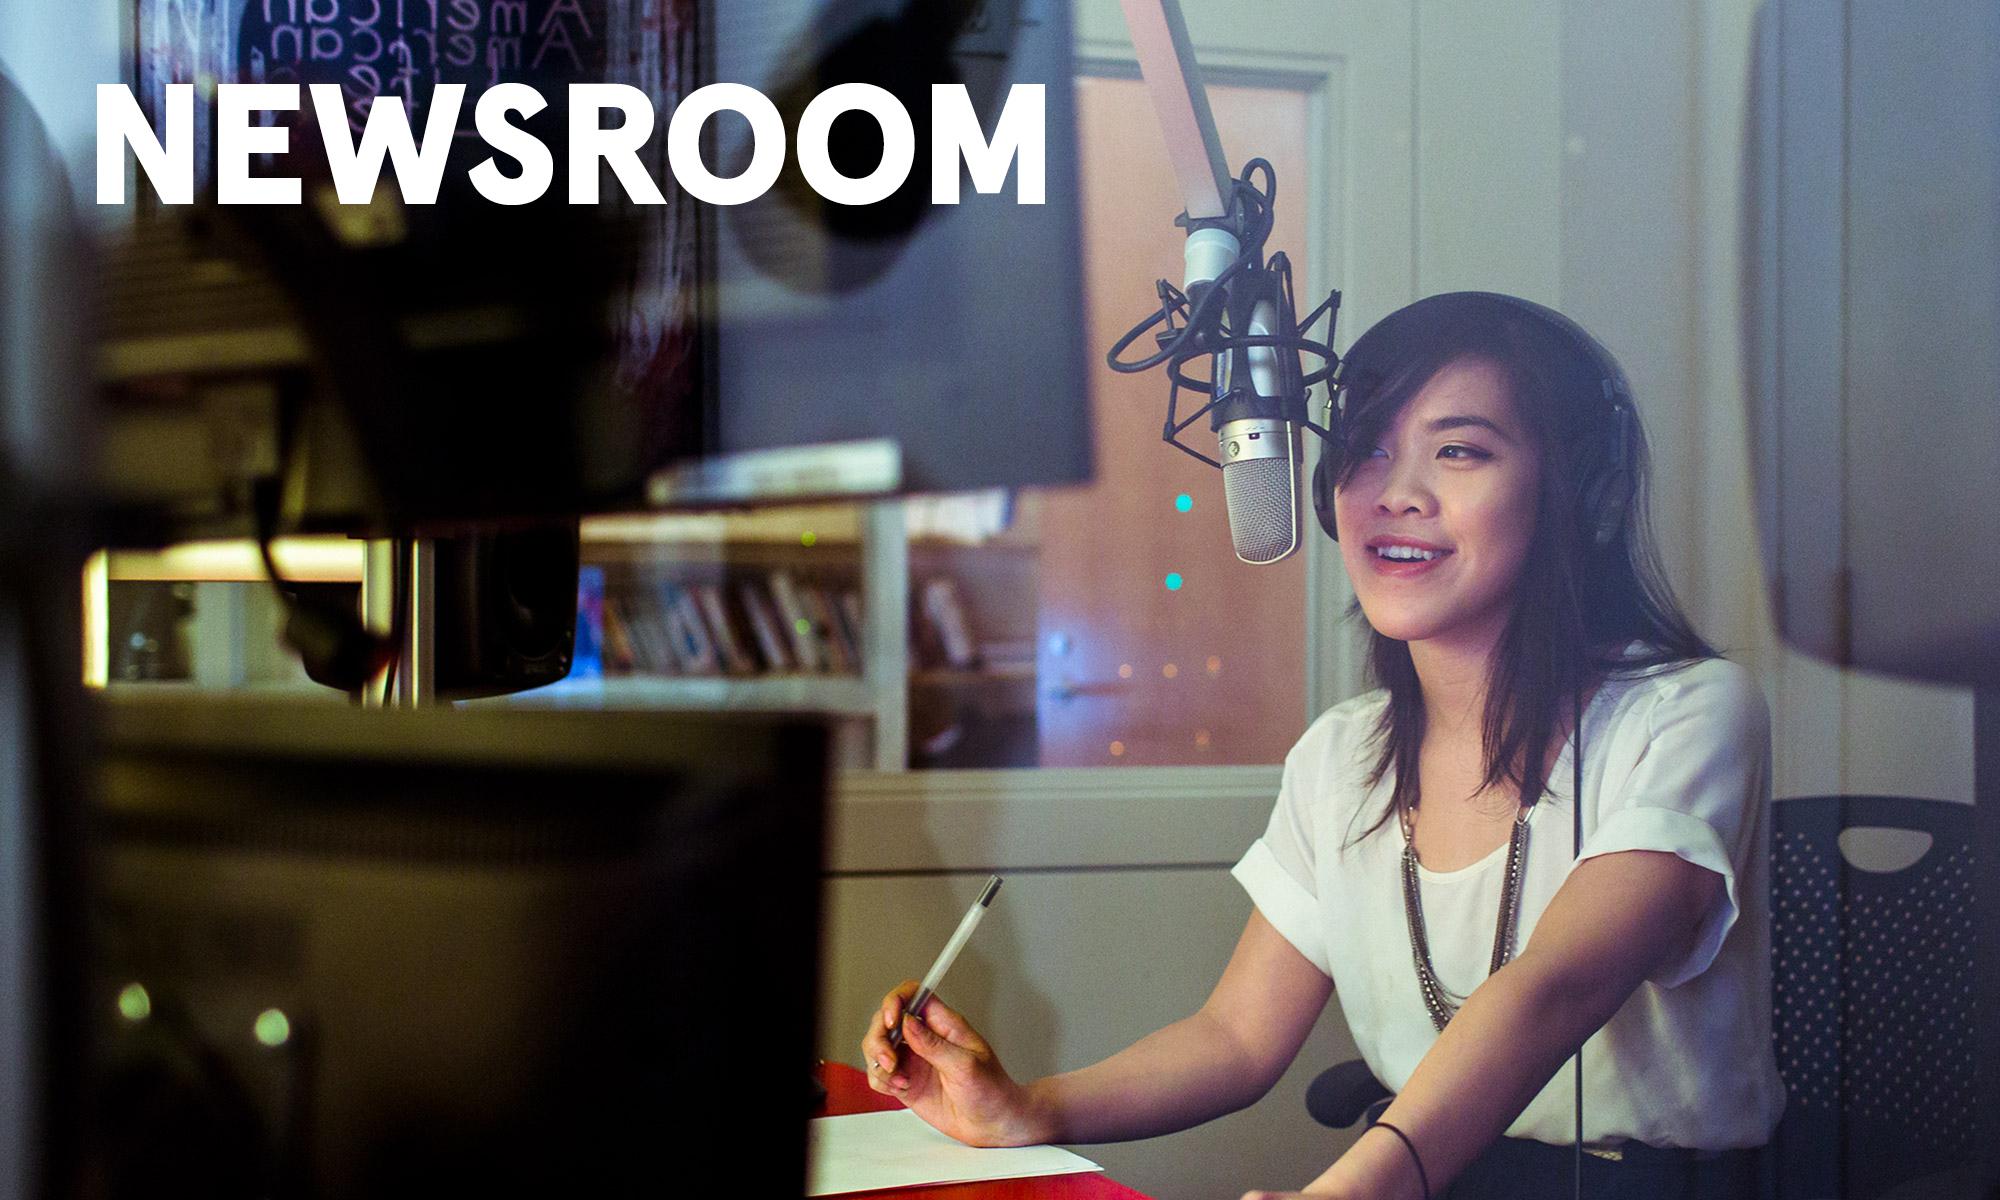 Brand Newsroom and social media management